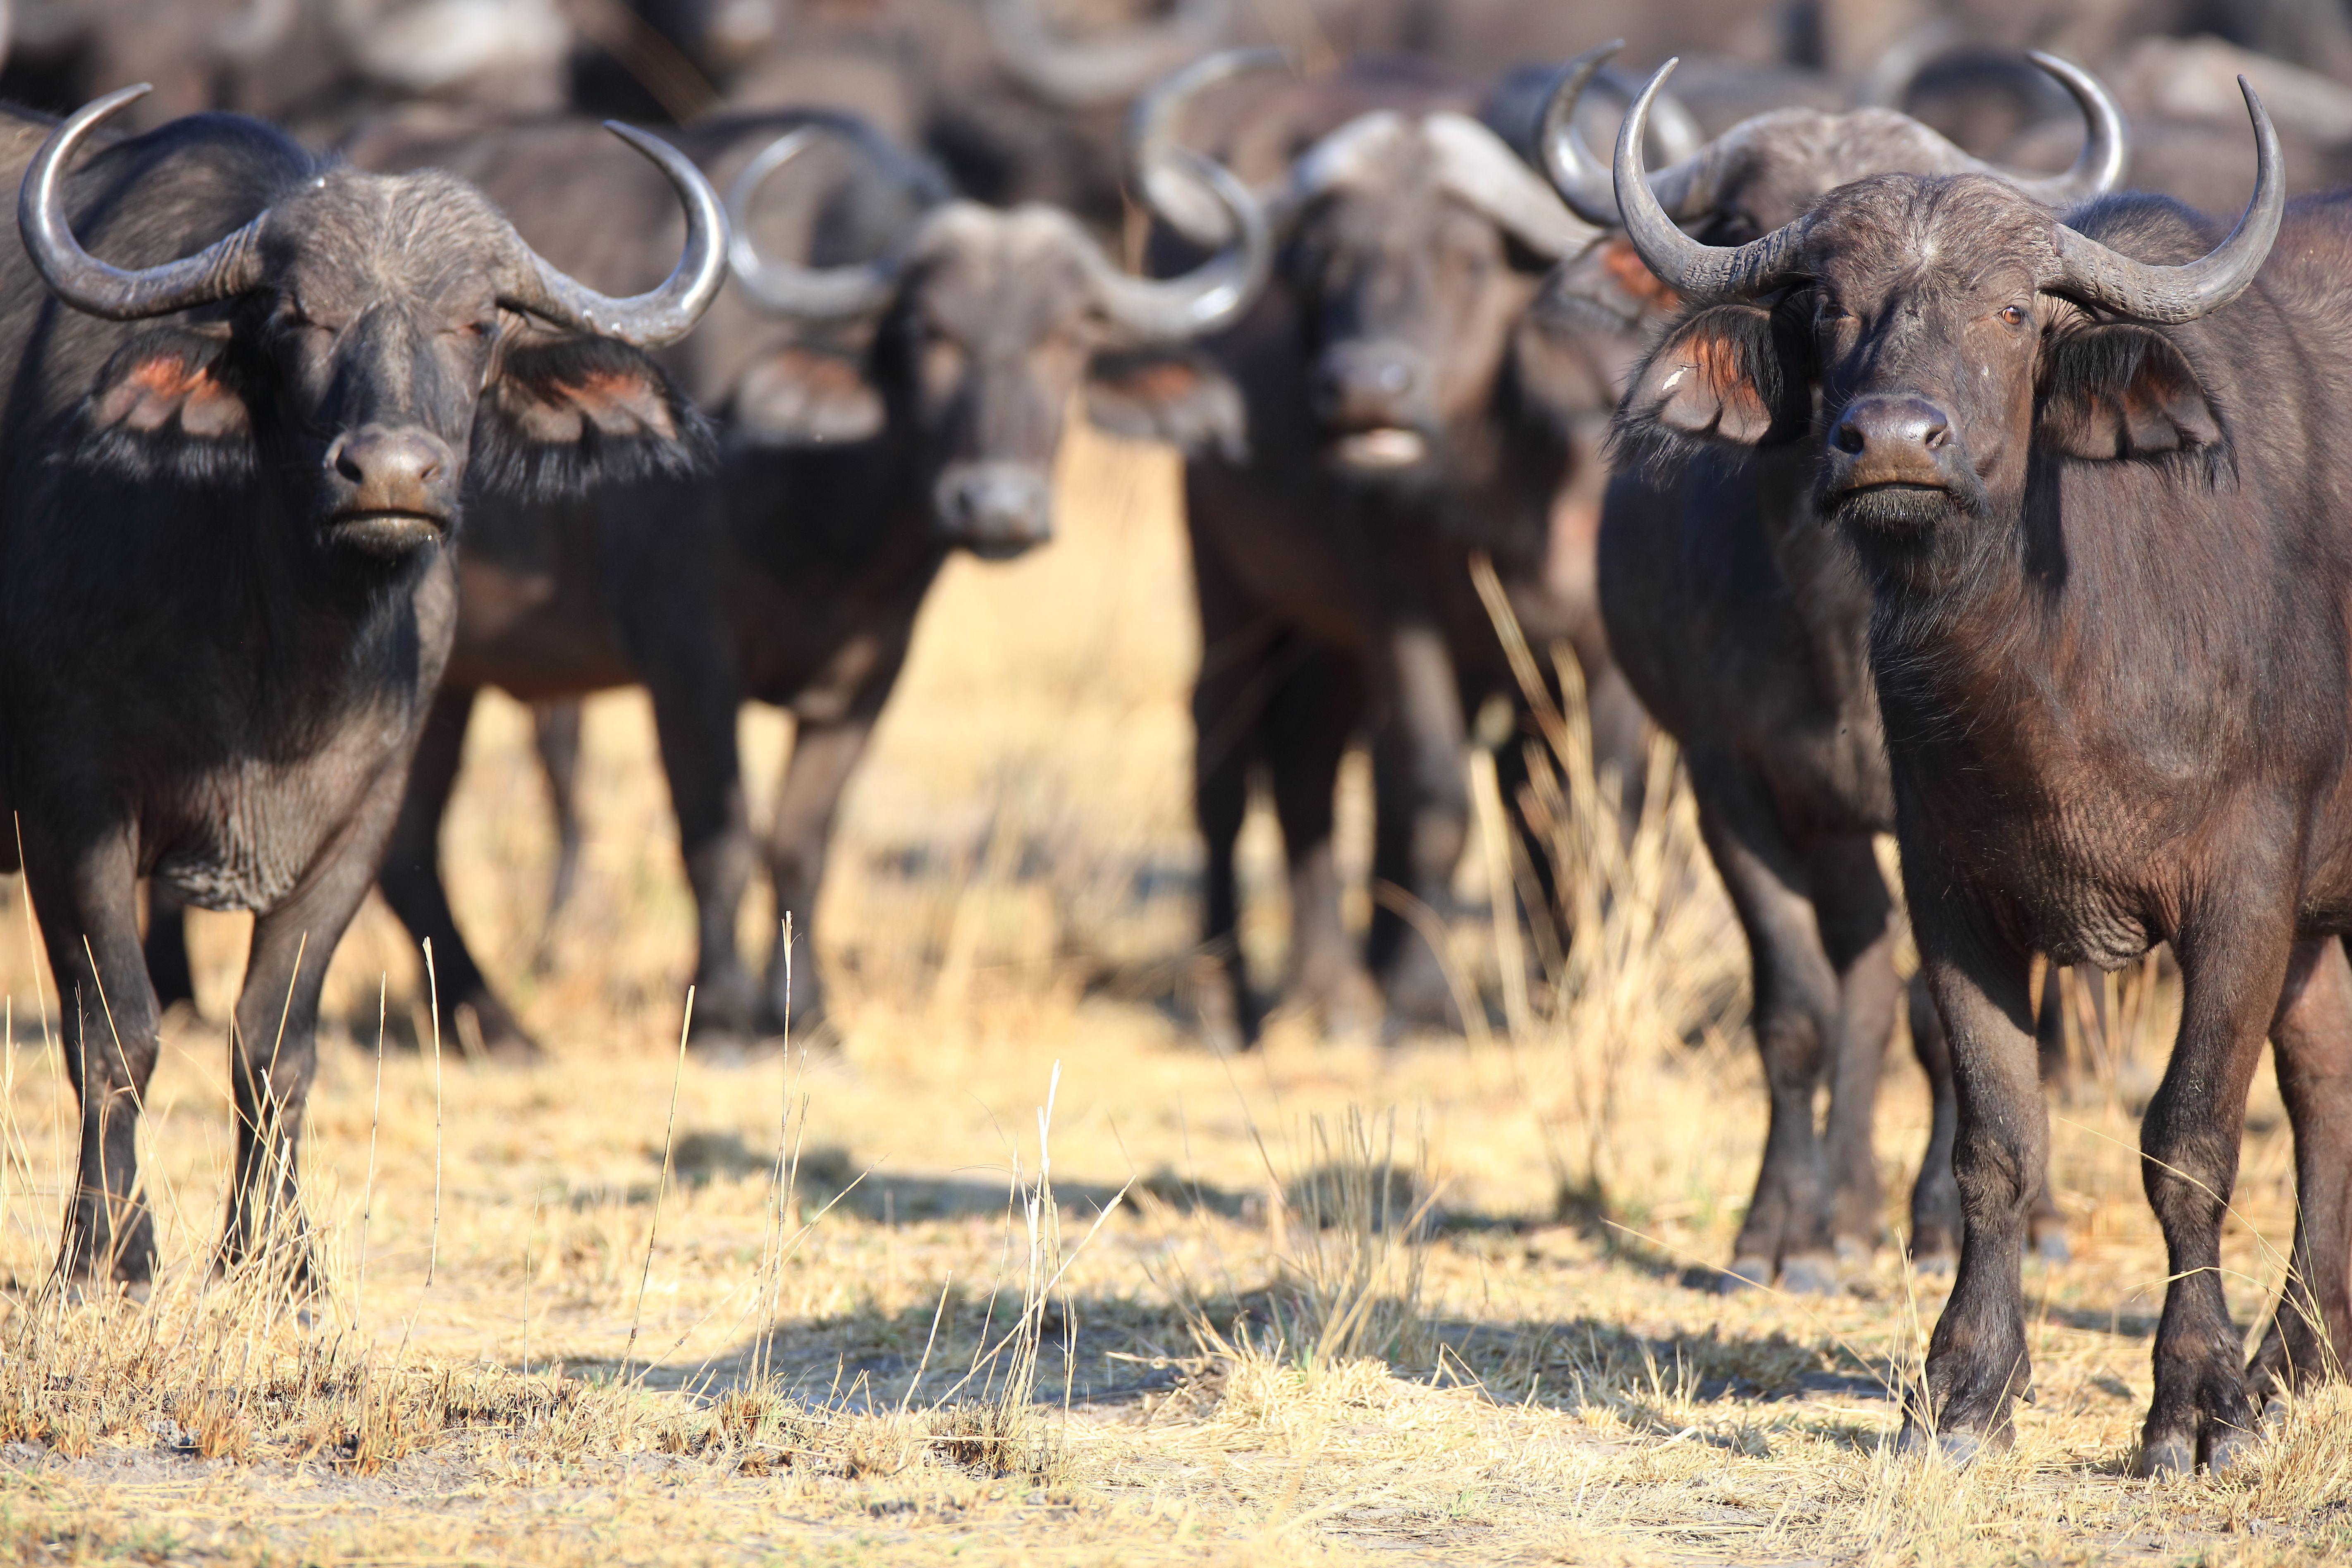 Top 10 List of Africa's Most Dangerous Animals